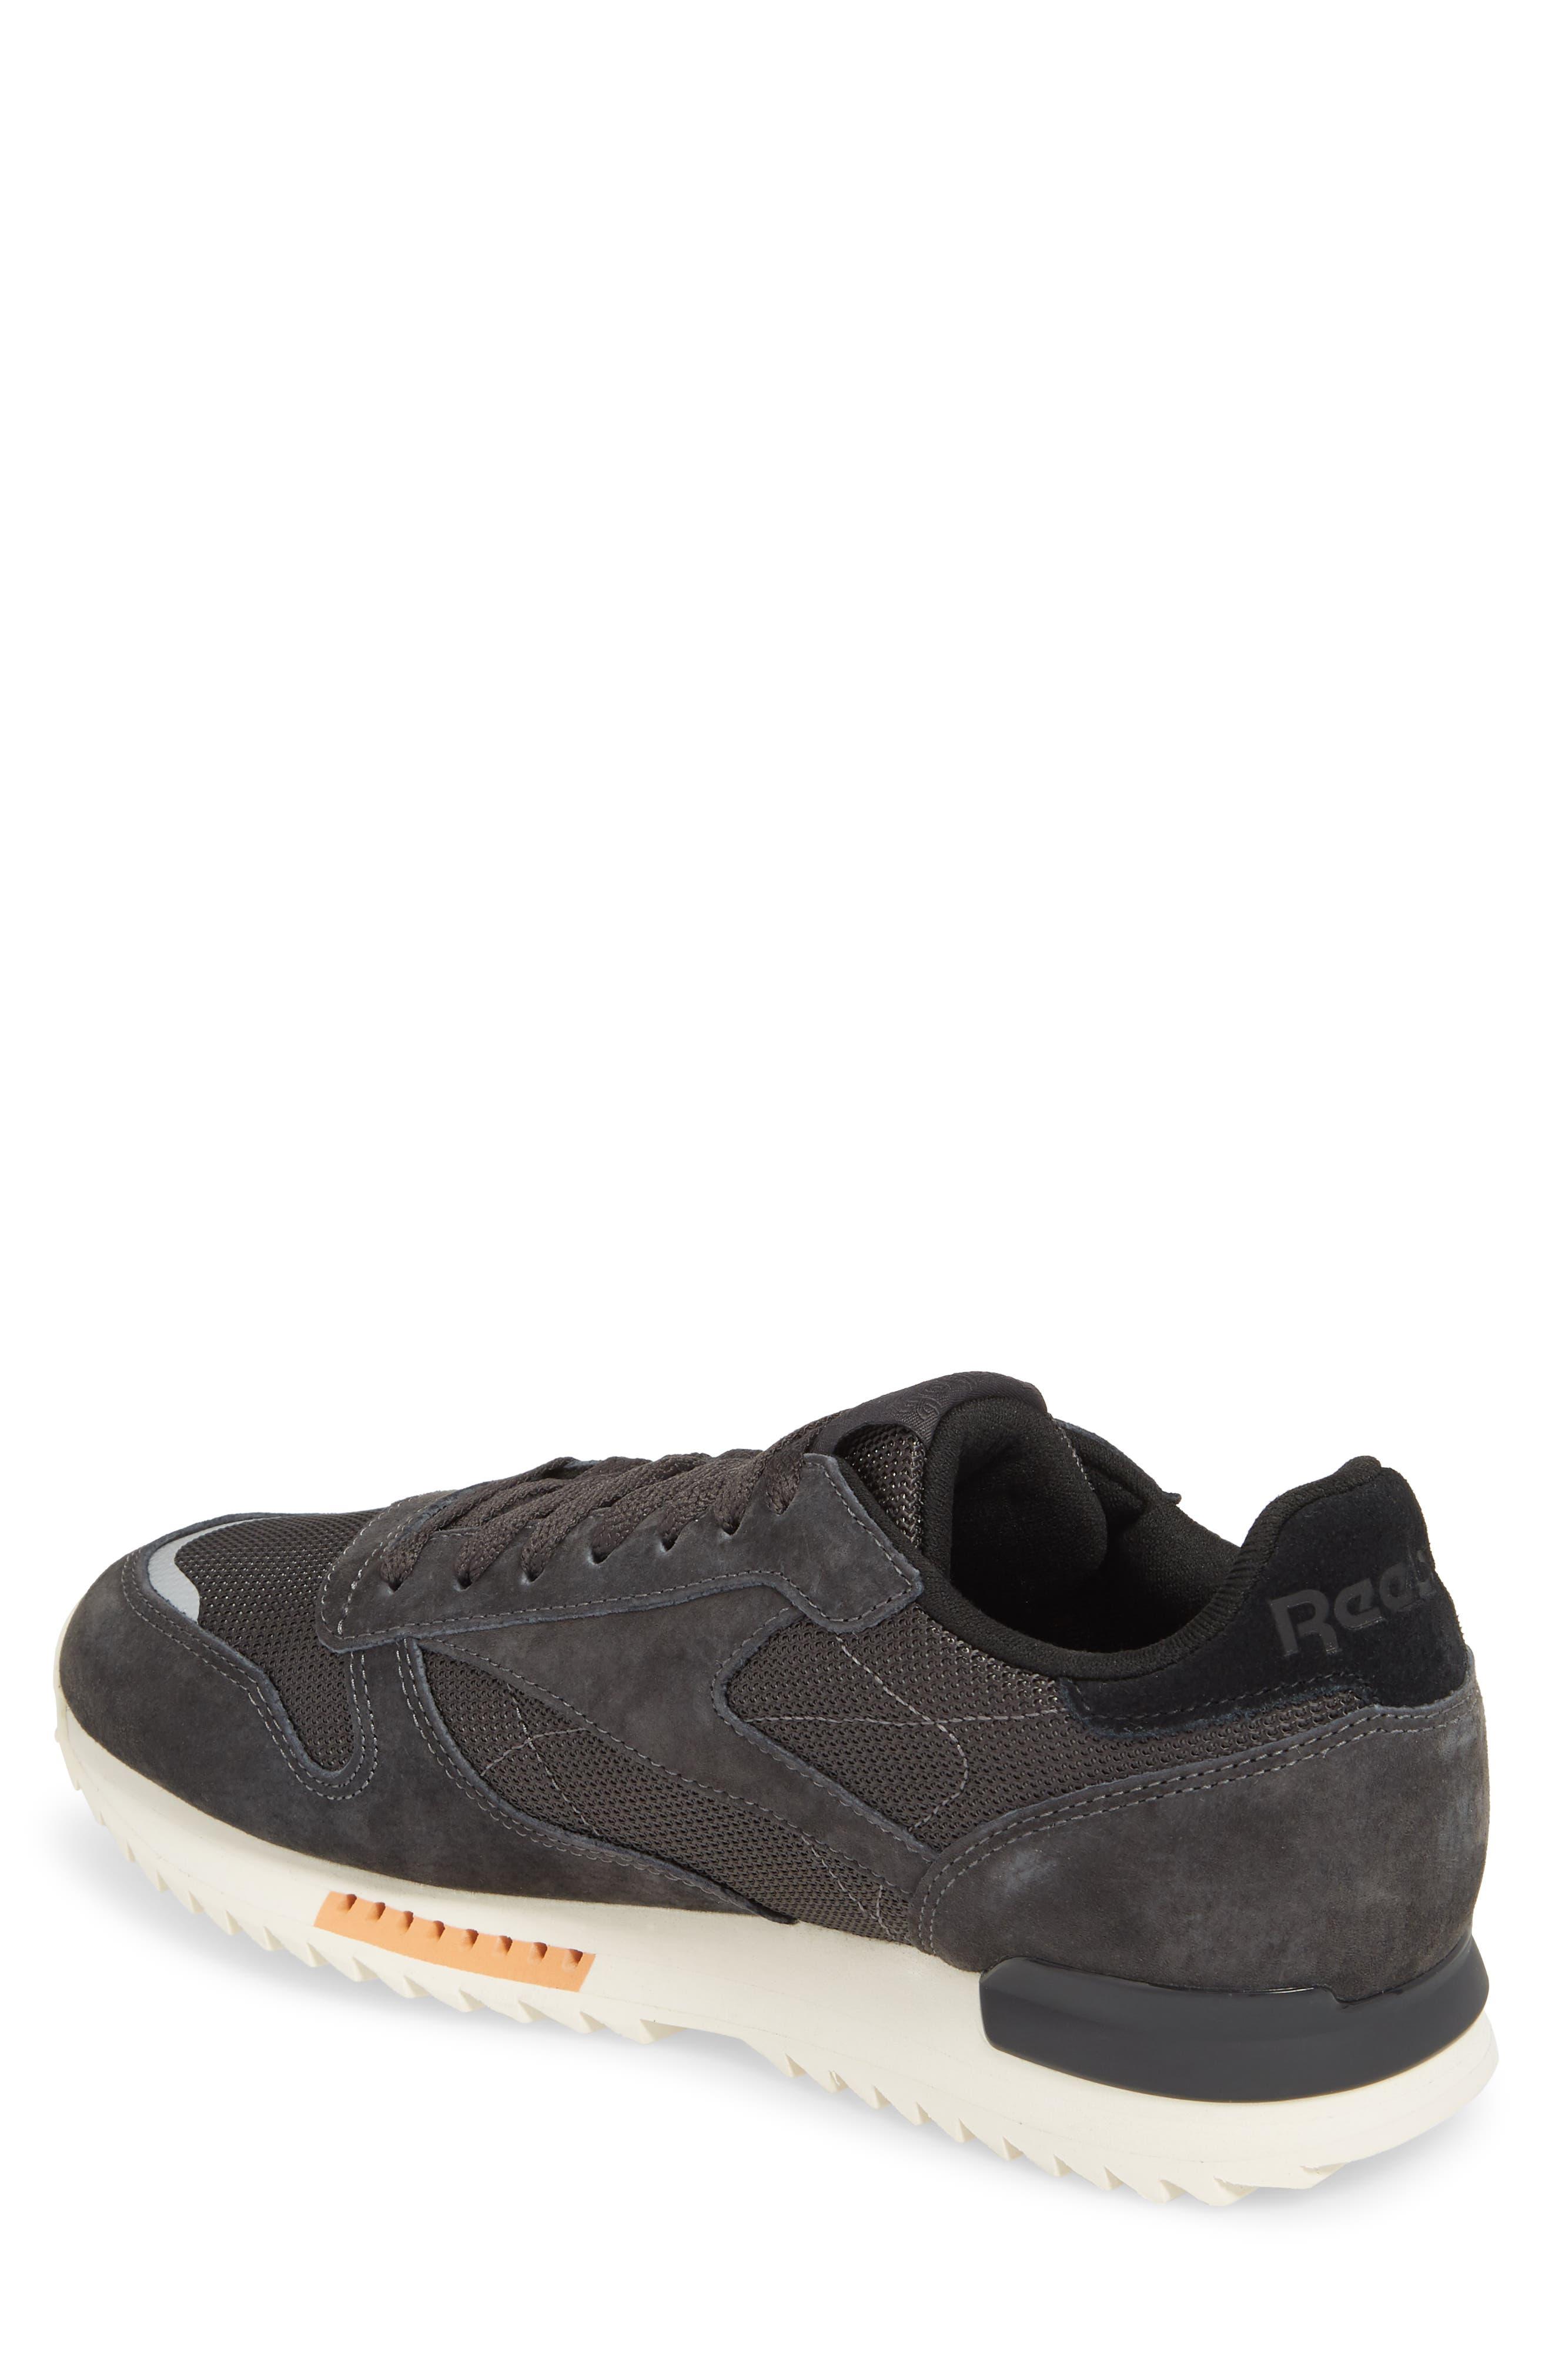 Classic Leather Ripple Sneaker,                             Alternate thumbnail 2, color,                             Coal/ Grey/ White/ Black/ Dust